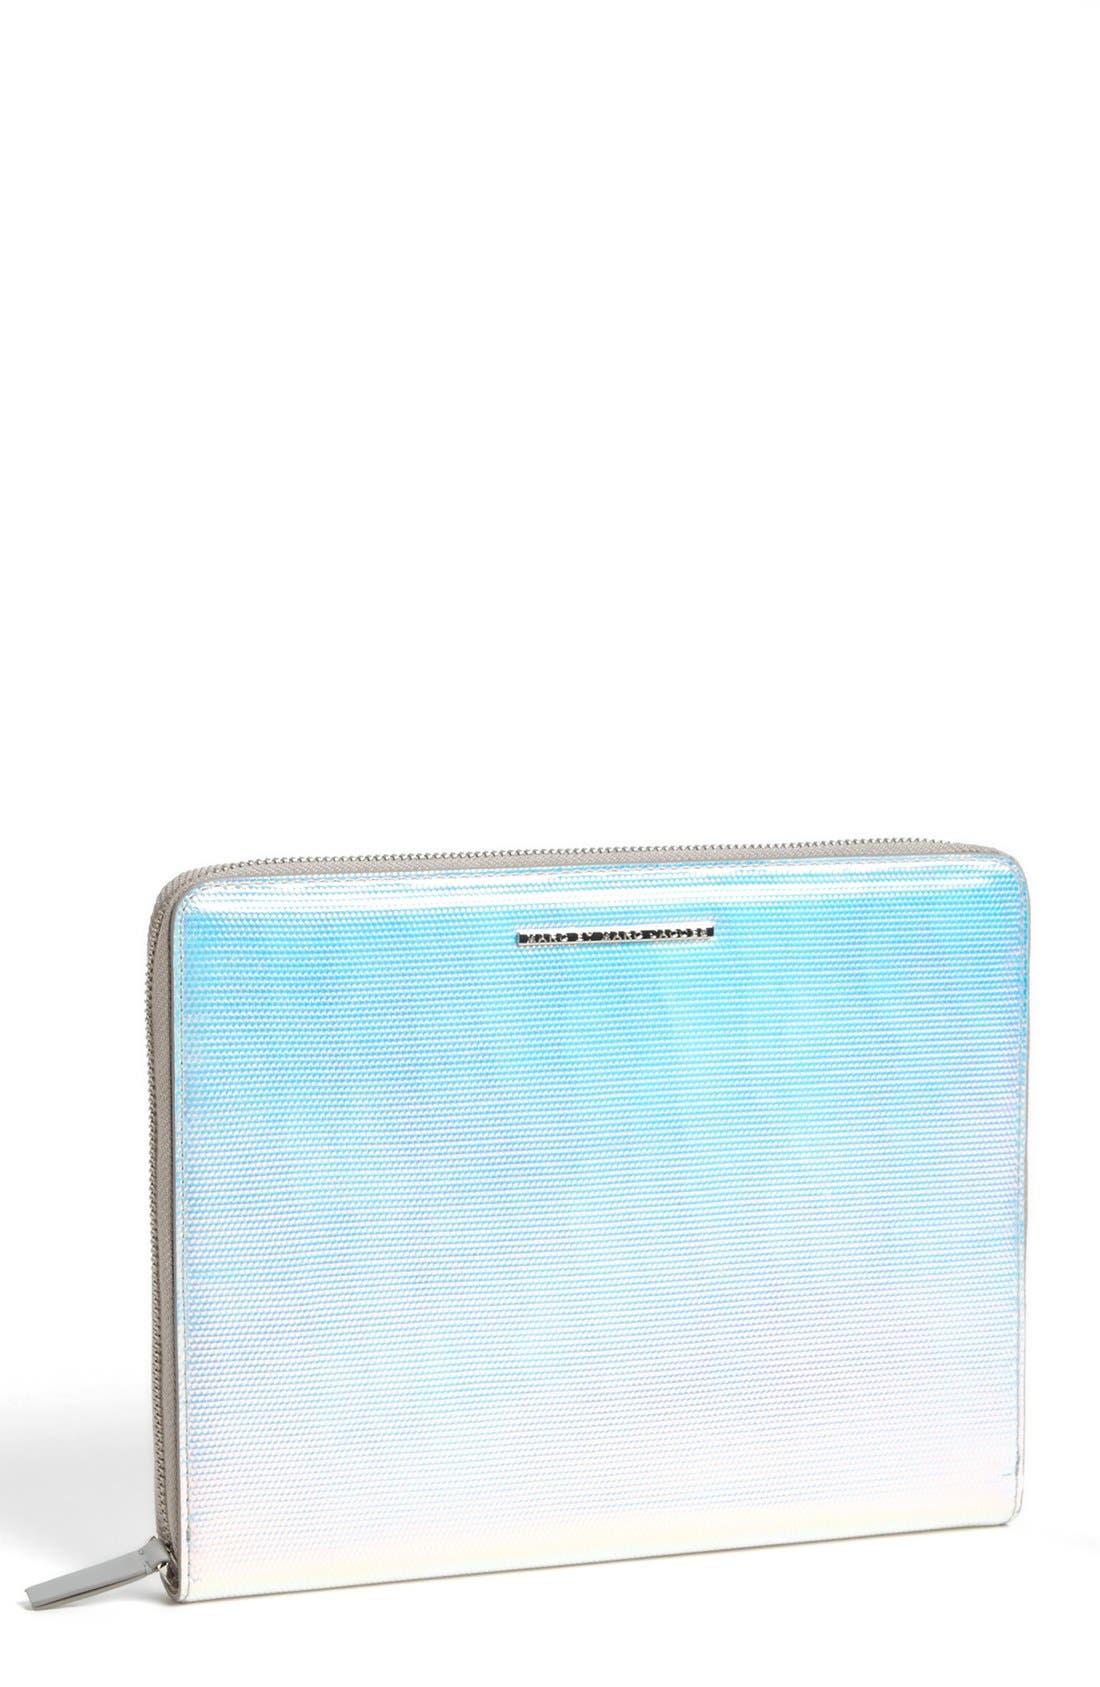 MARC JACOBS MARC BY MARC JACOBS 'Chameleon' iPad 3 & 4 Case, Main, color, 040